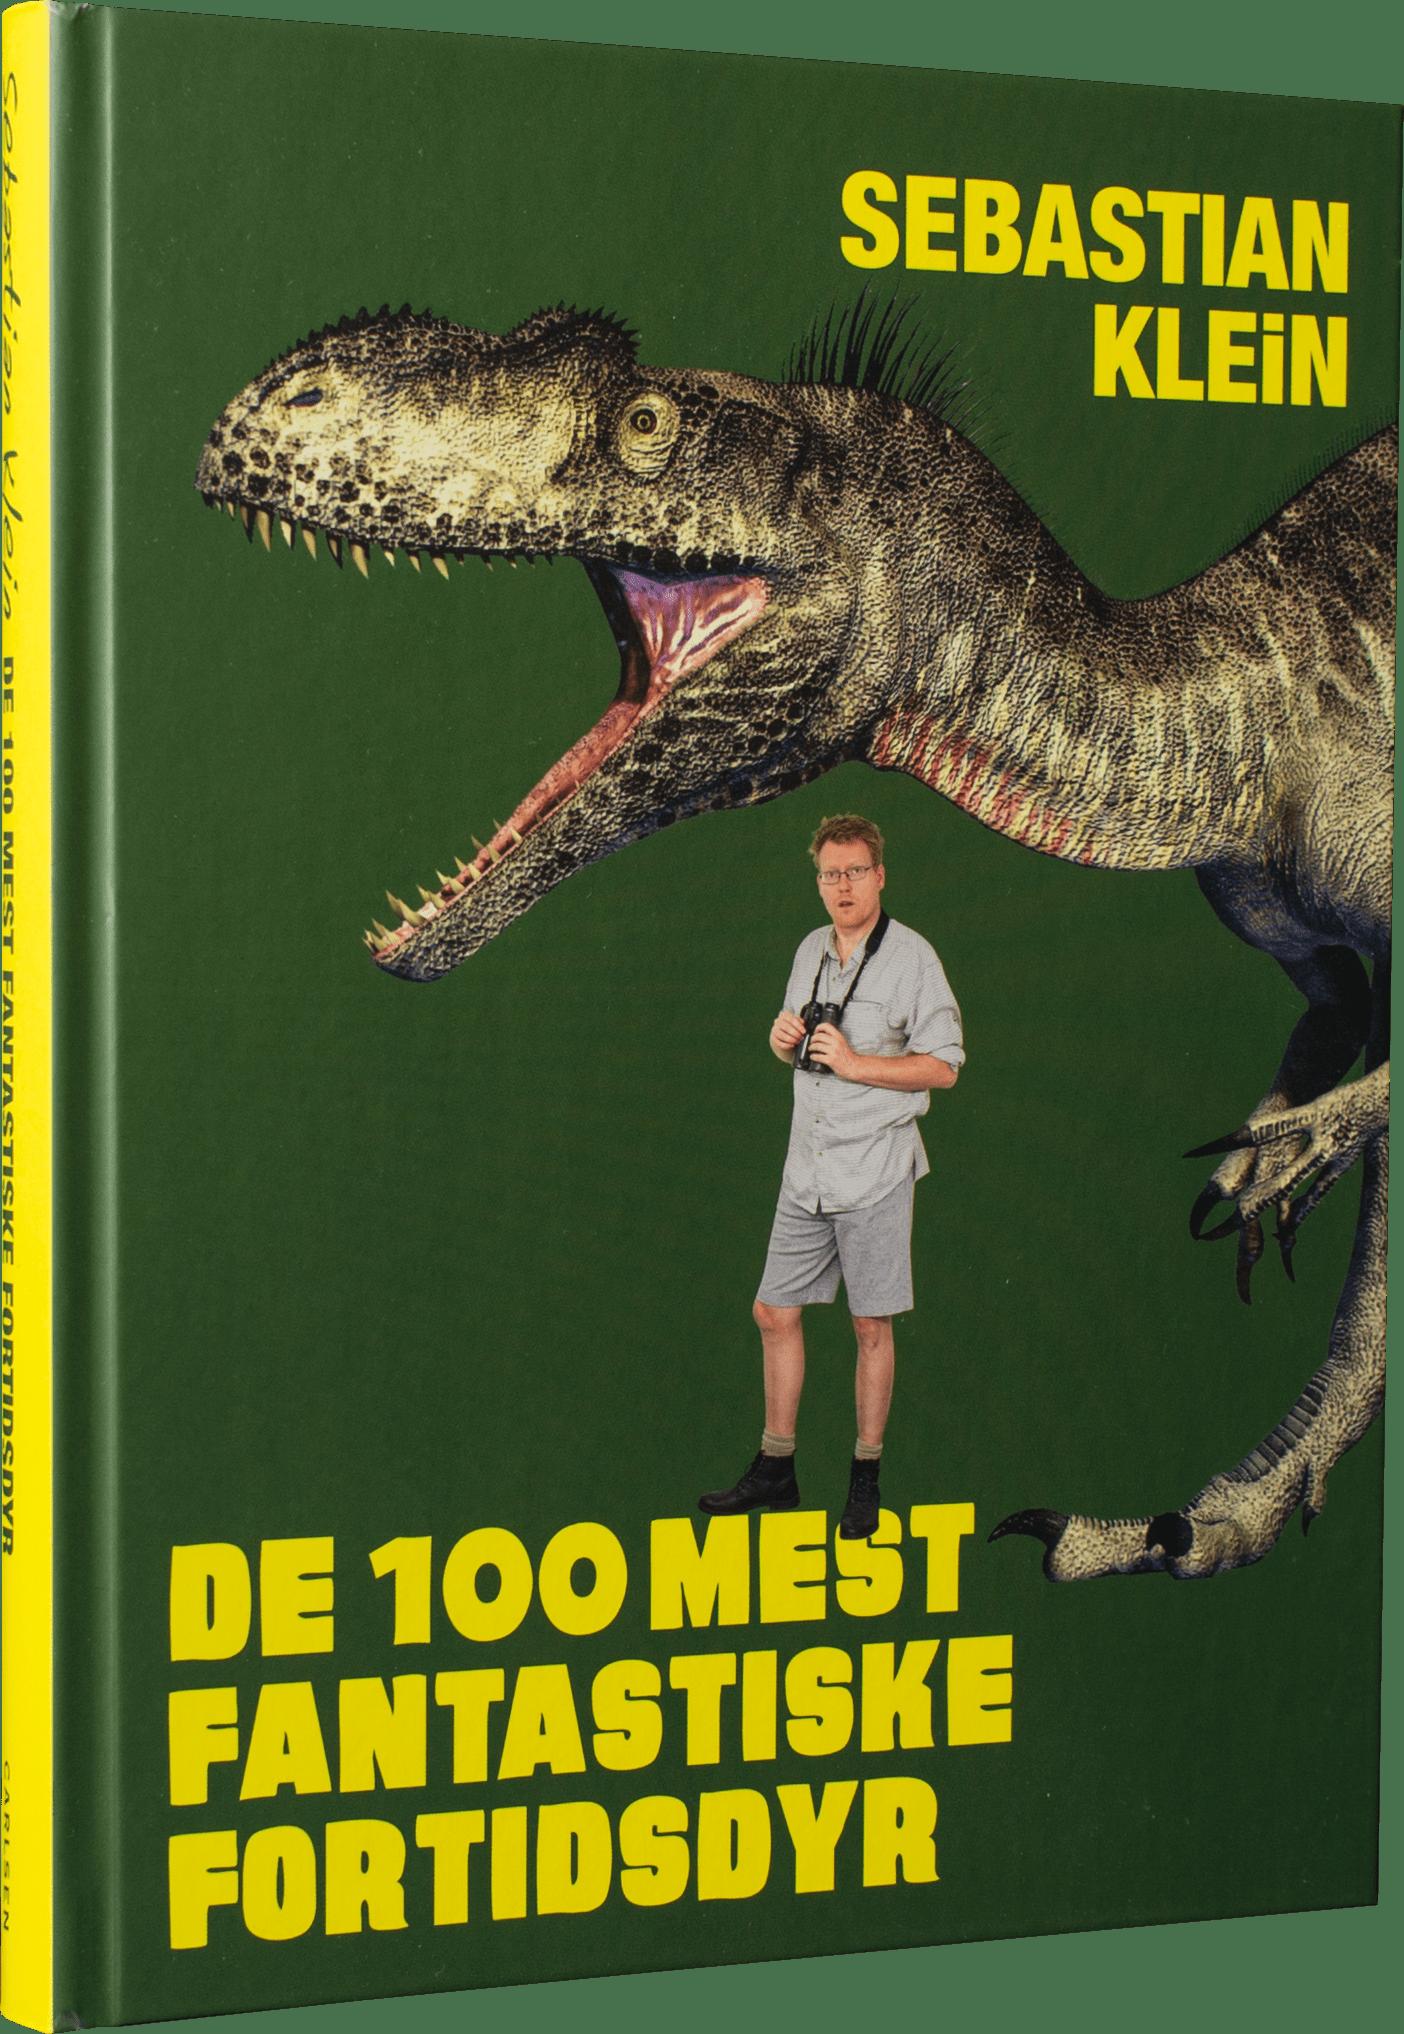 De 100 mest fantastiske fortidsdyr, Sebastian klein, dyr, dinosaurer, fortidsdyr, børnebøger